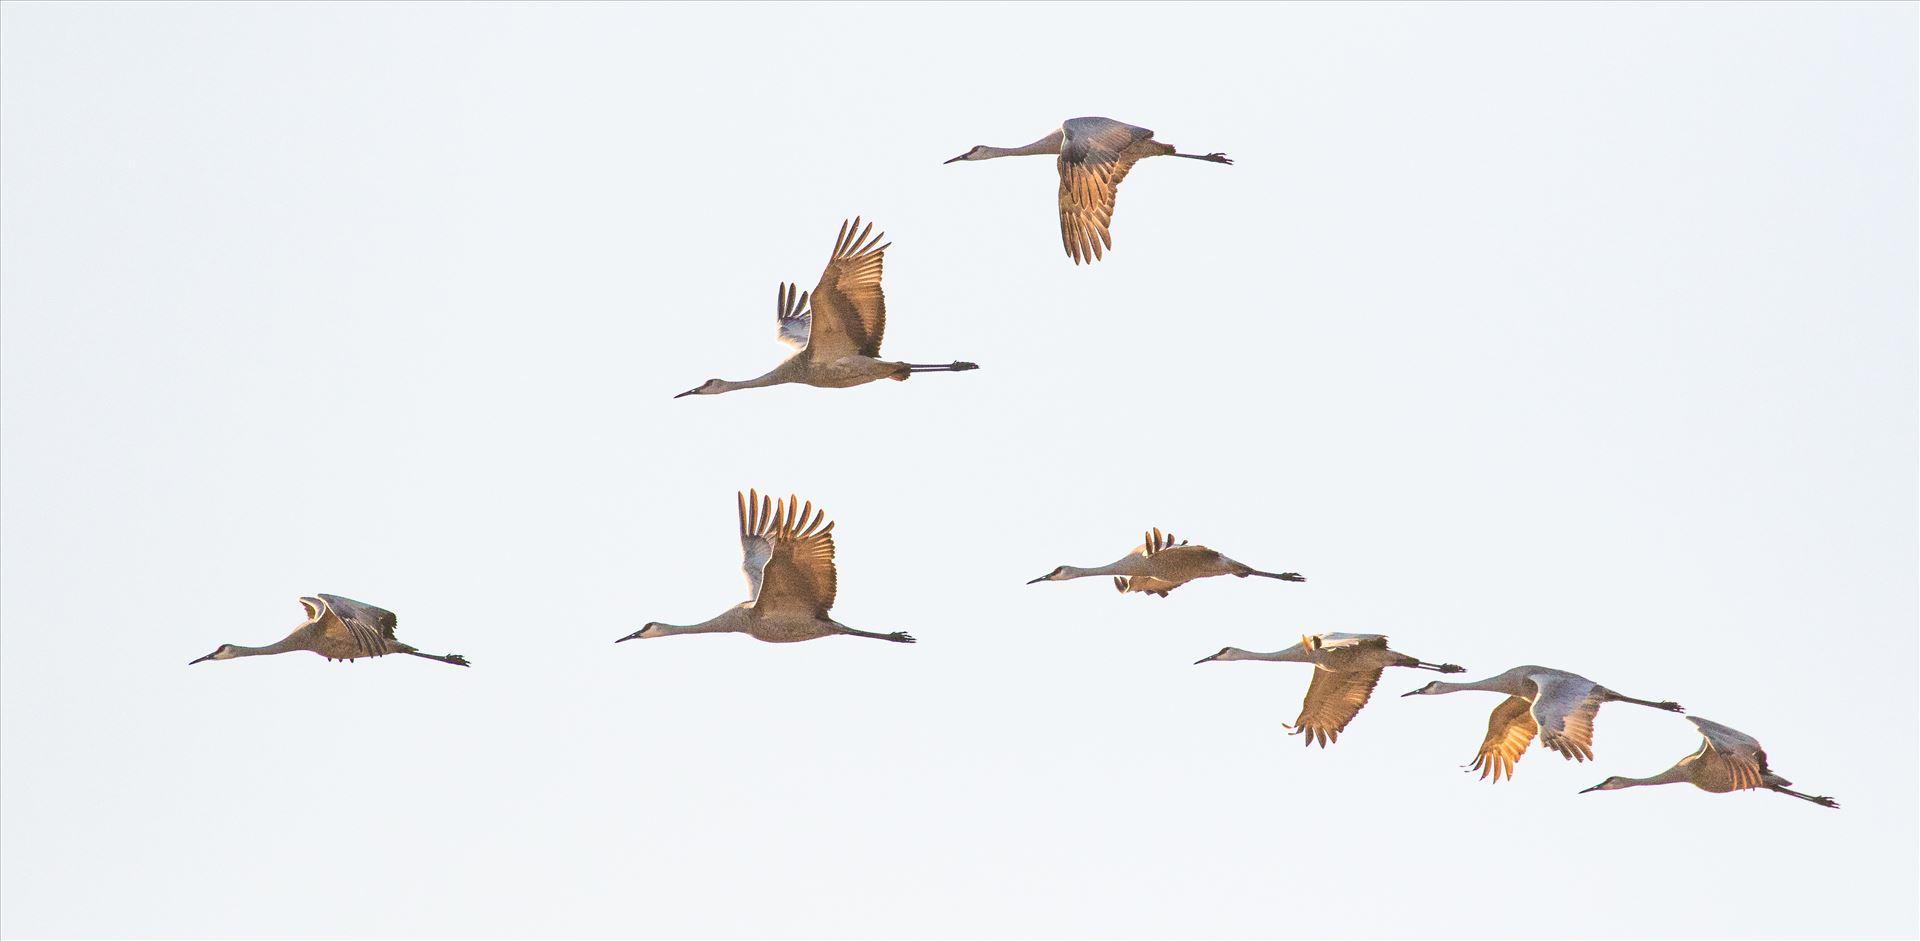 6K9A6457.jpg by Dan Ferrin Photography-Sandhill Cranes